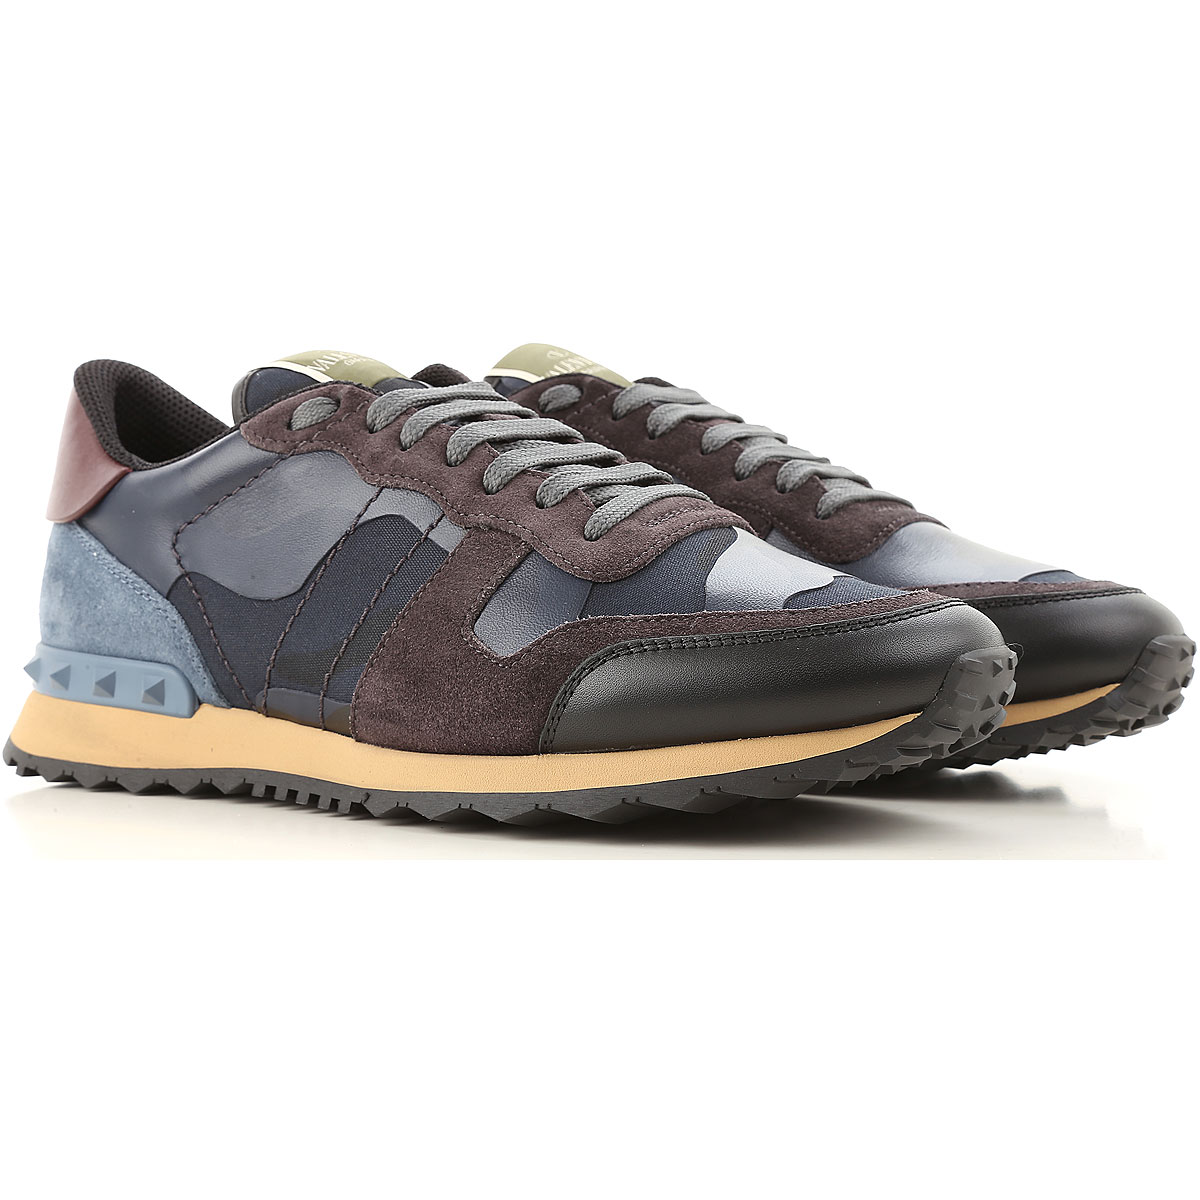 Mens Shoes Valentino Garavani, Style code: qy2s0723-tcc-m14